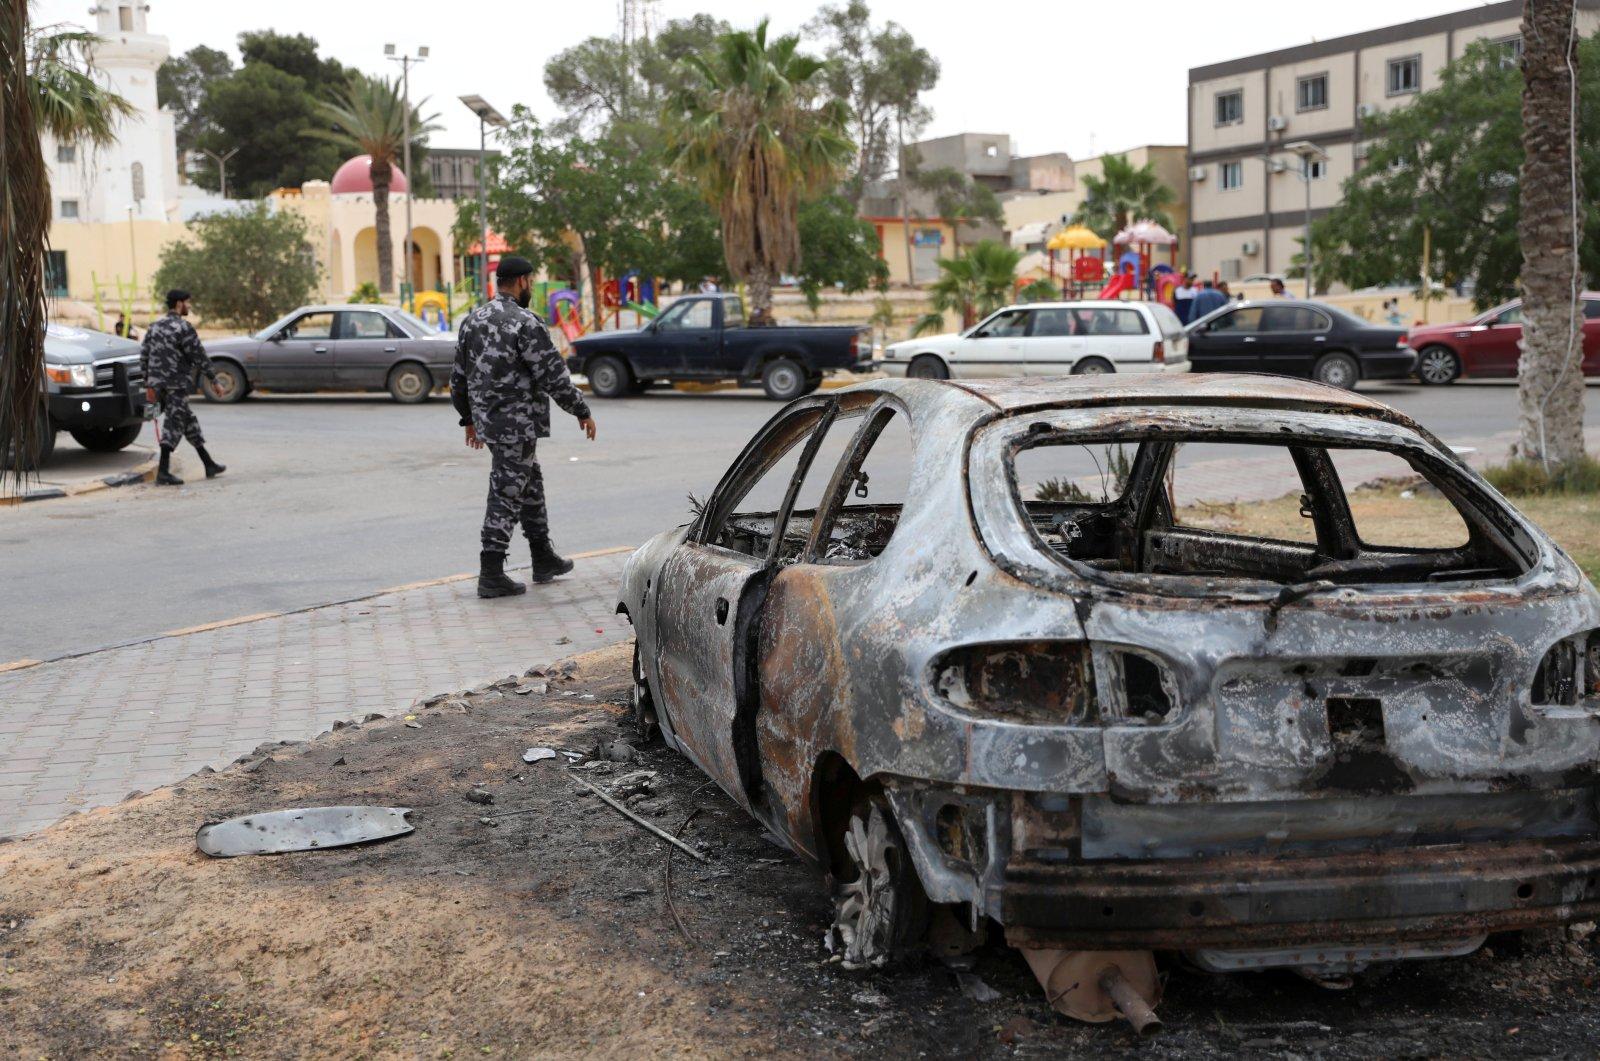 Libyan policemen walk near a damaged car during a security deployment in Tarhouna city, June 11, 2020. (REUTERS)